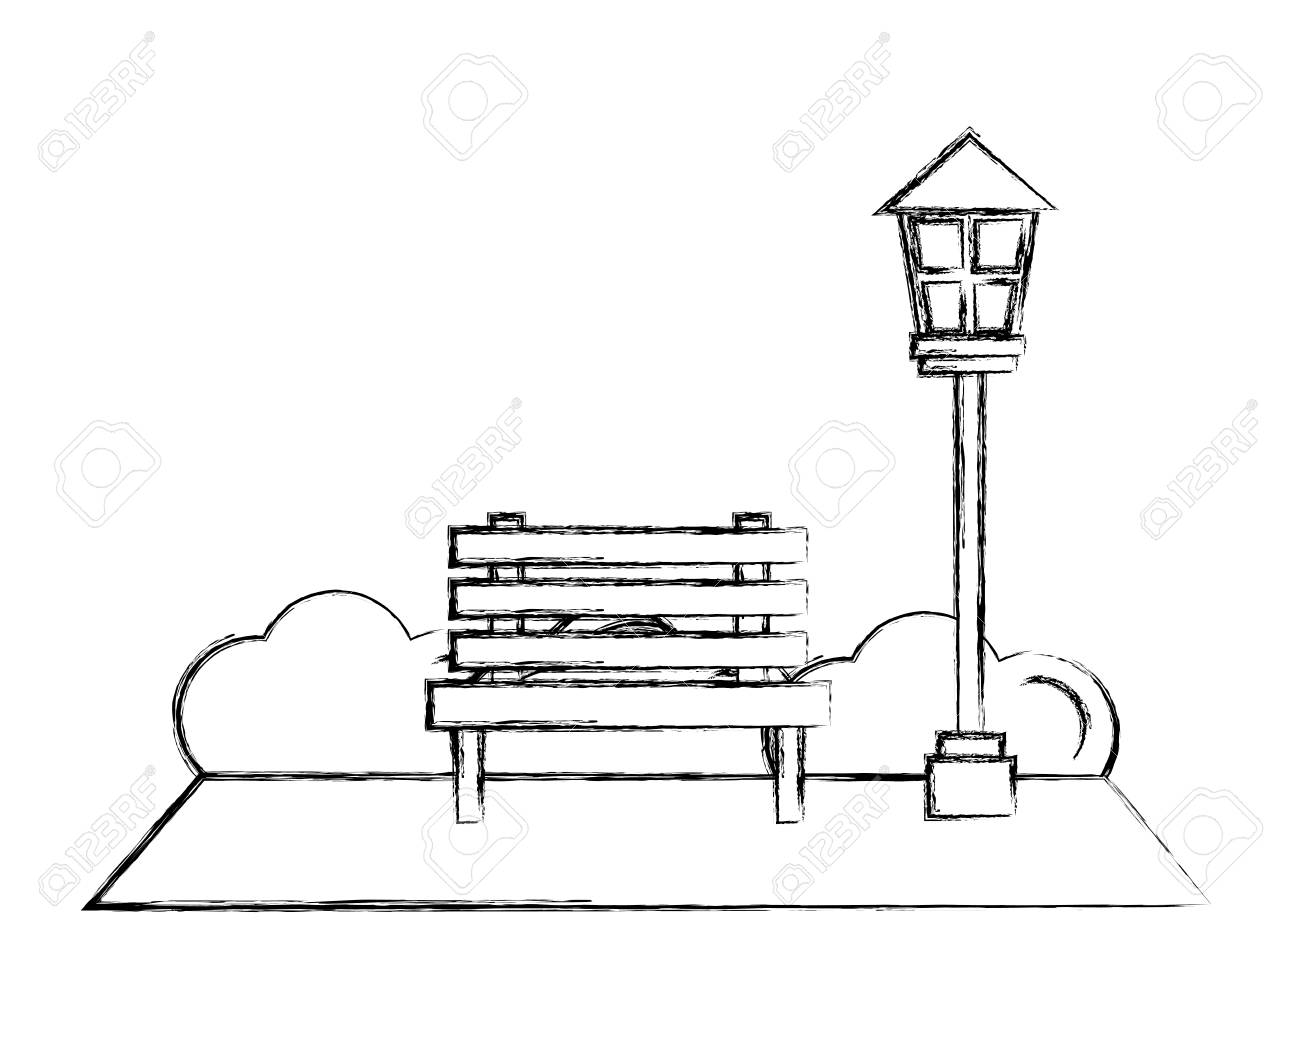 Park Bench Lamppost Bushes Natural Vector Illustration Hand